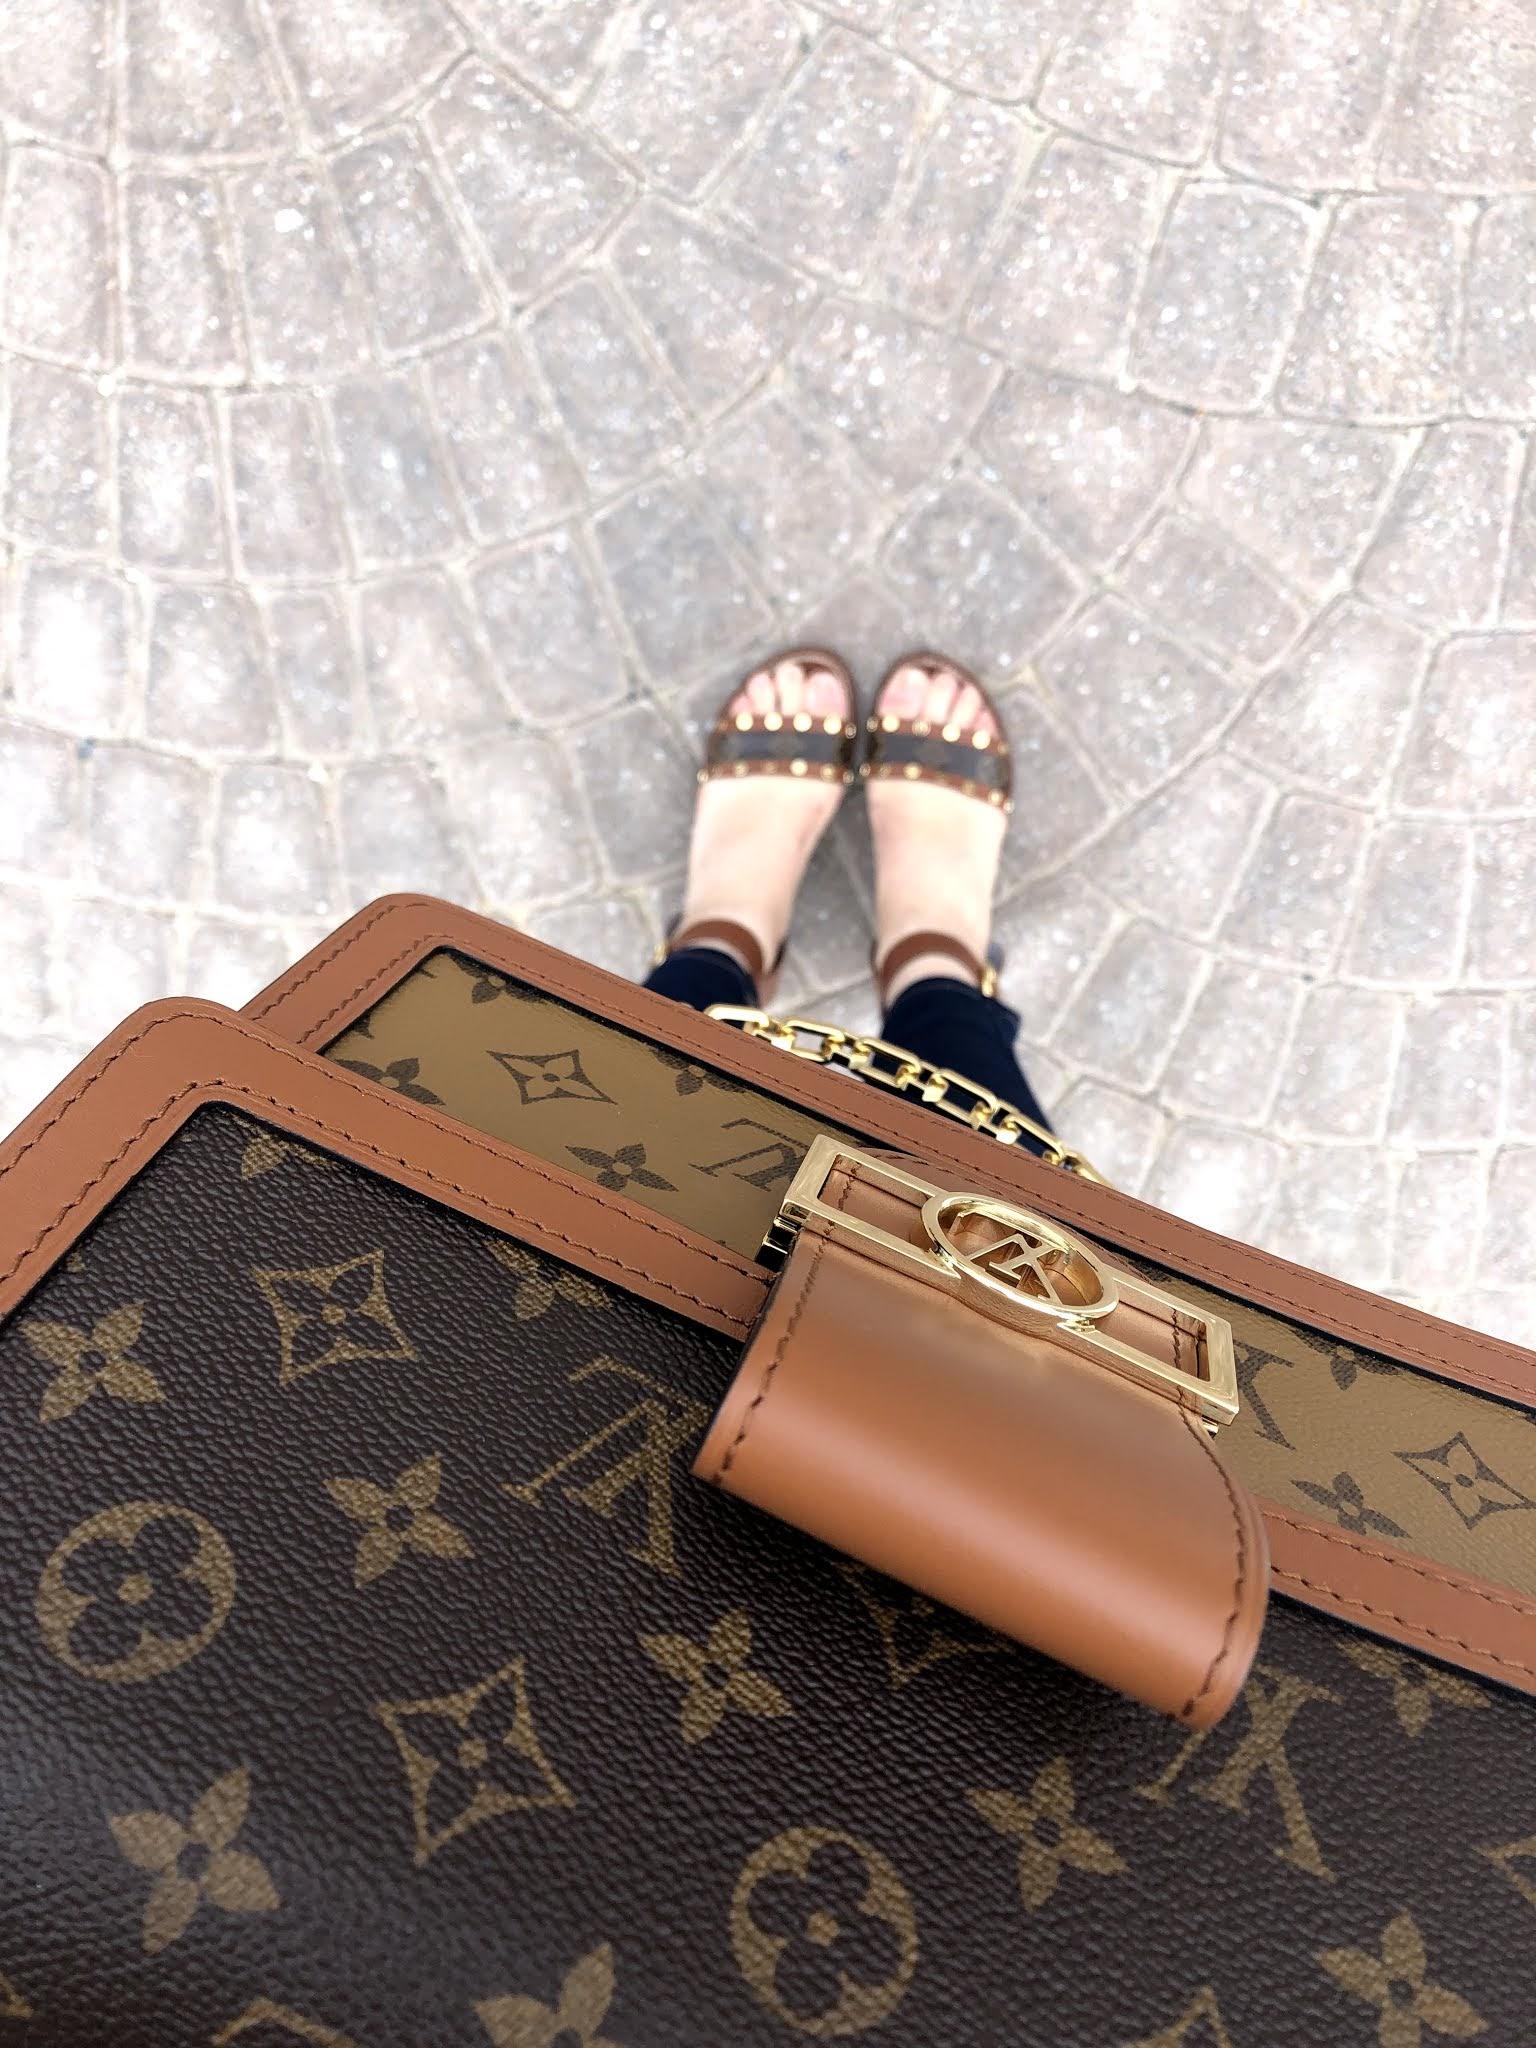 Louis Vuitton Dauphine MM handbag mod shot